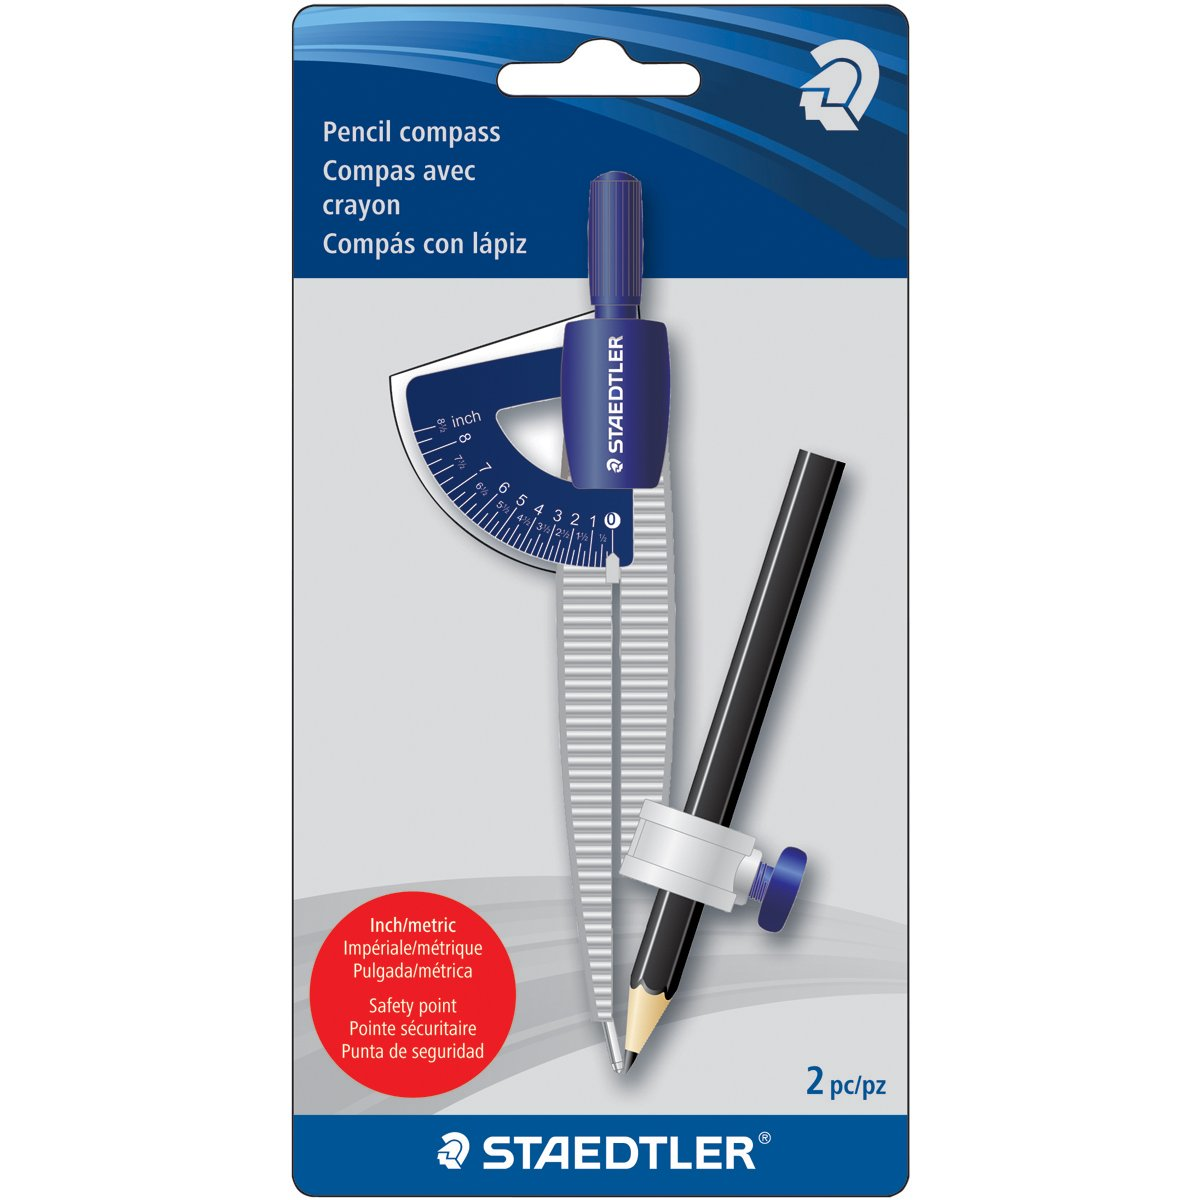 Staedtler Compass Measuring Tool (557 SCBKA6) by STAEDTLER (Image #2)